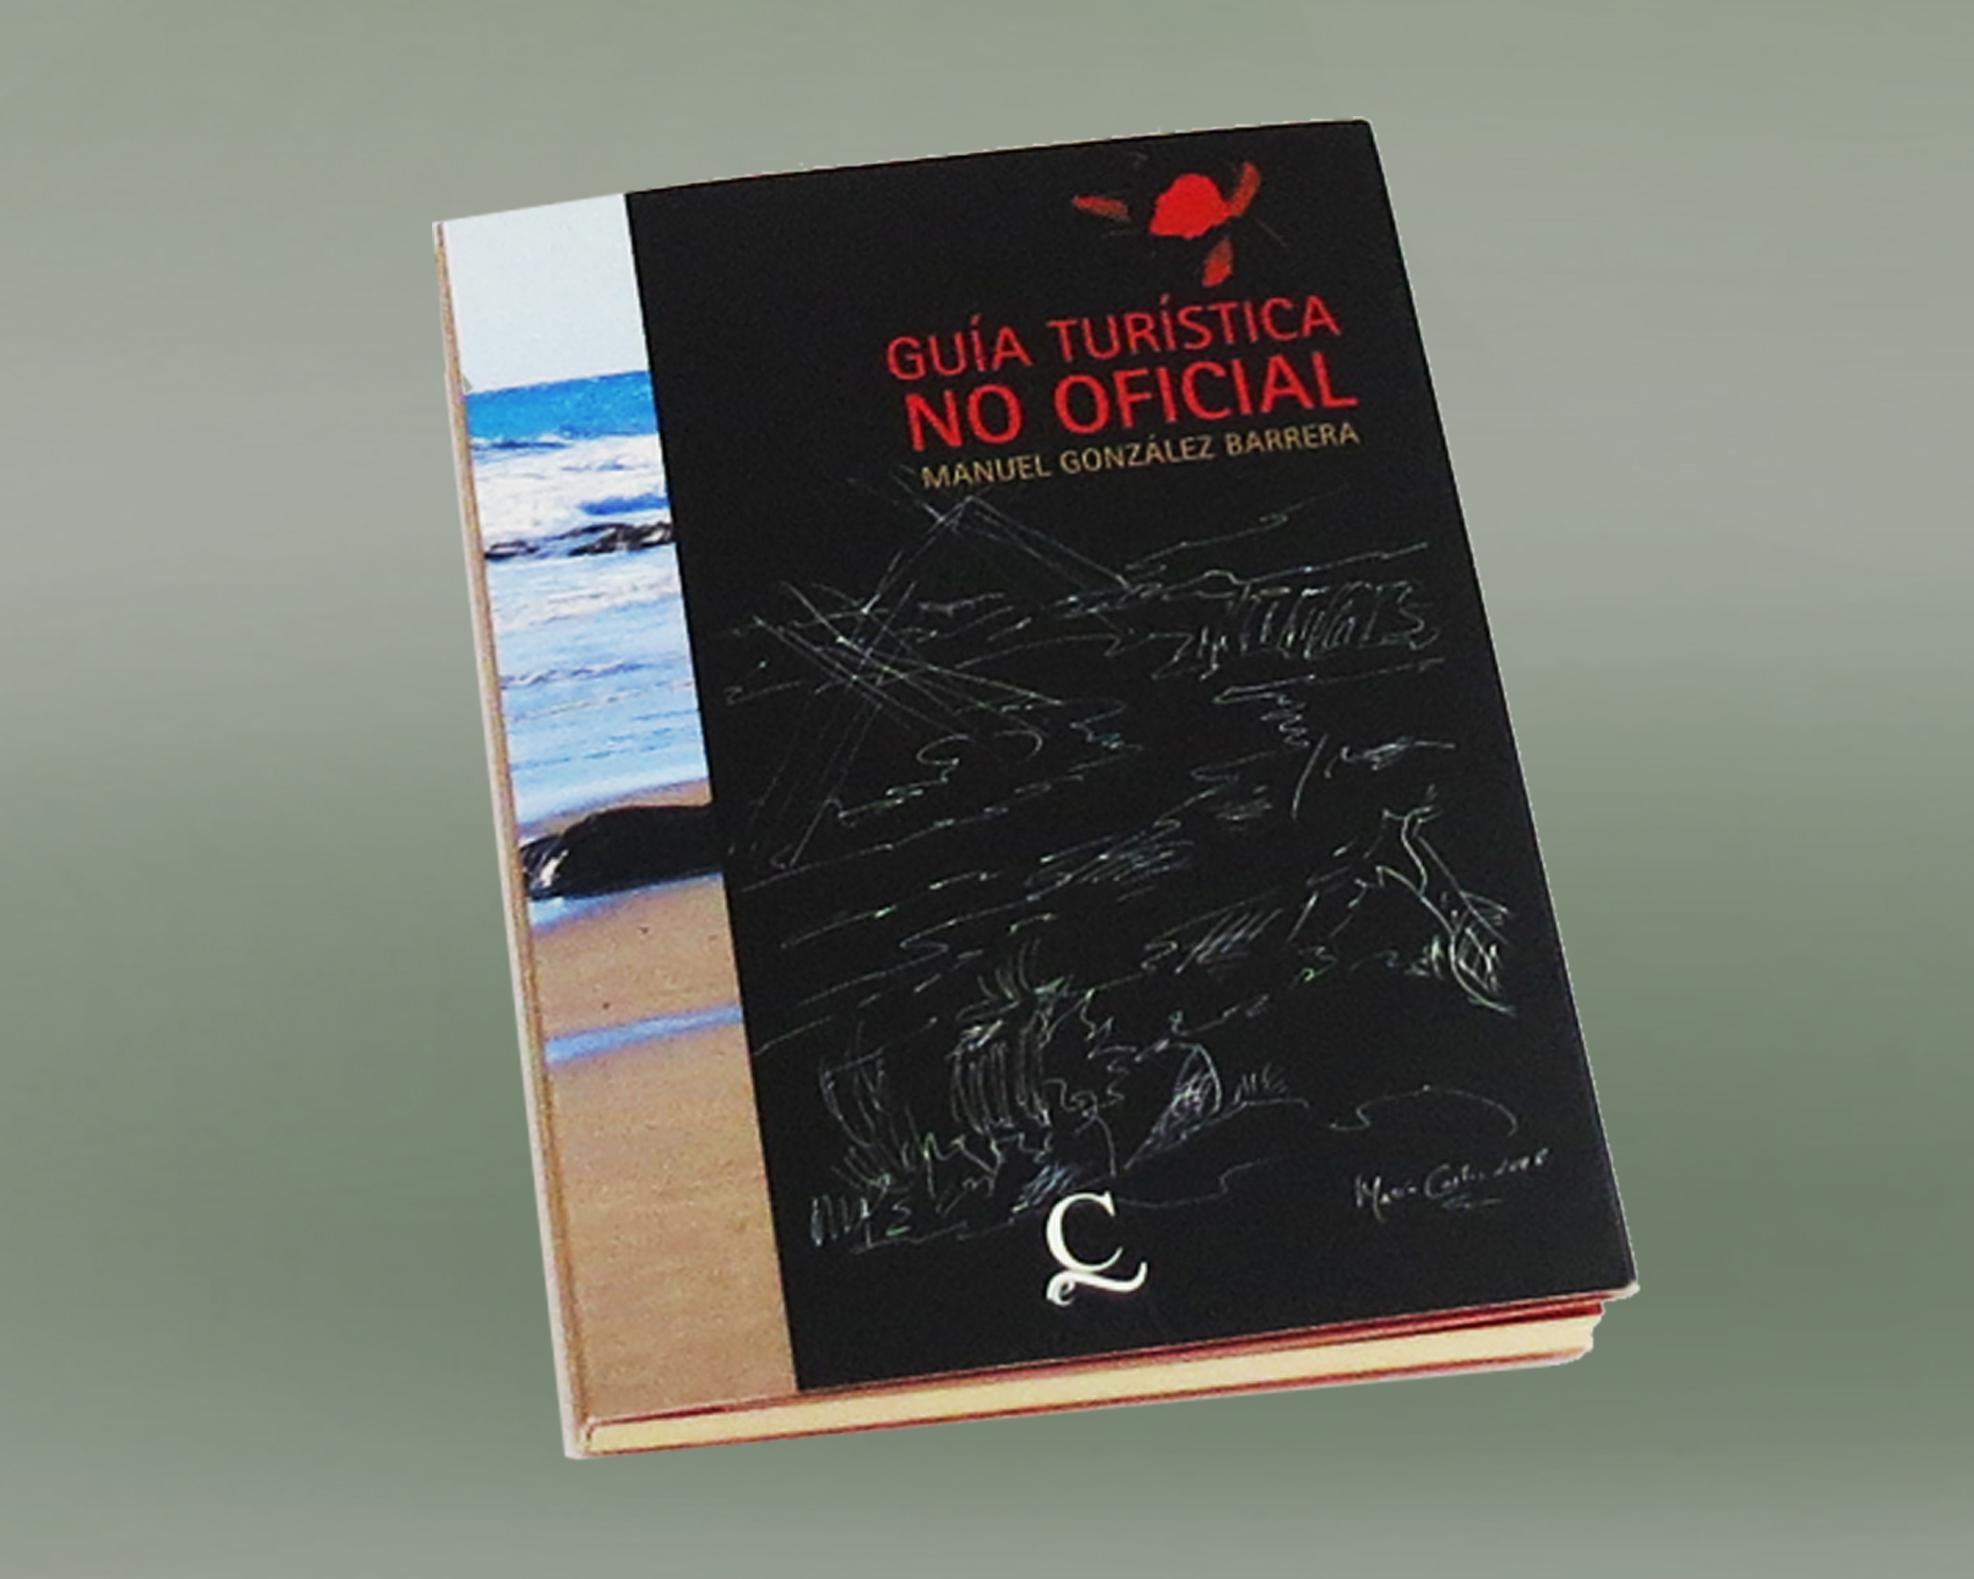 mpresion-libros-canarias